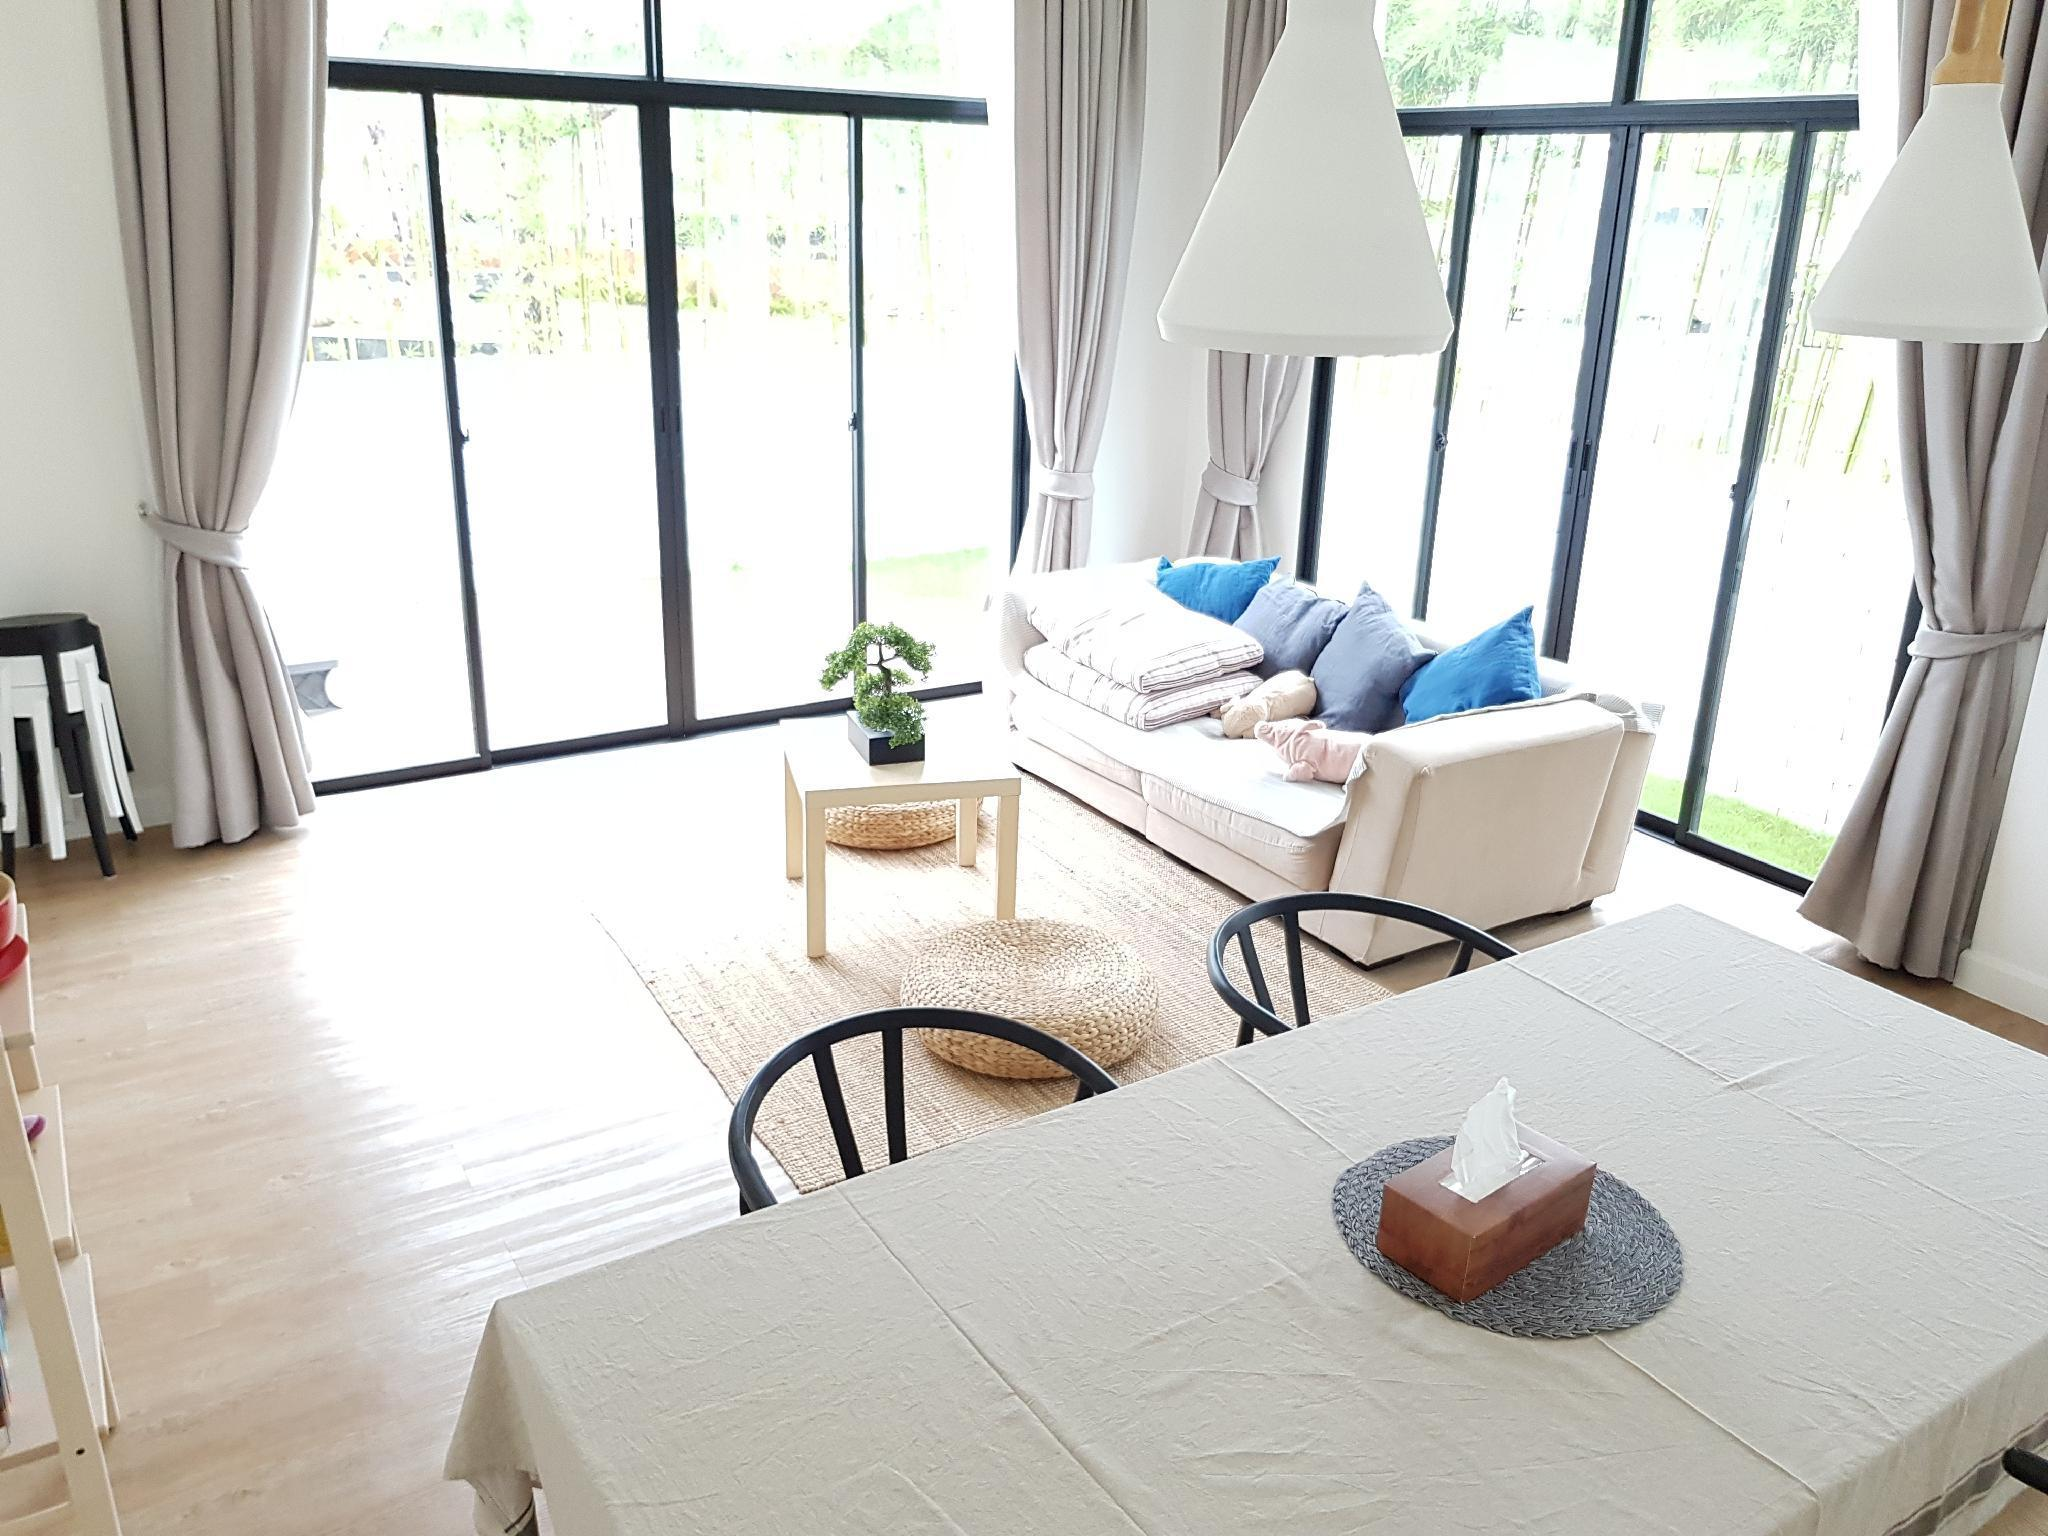 Jacuzzi 3Bedroom Villa in Chalong วิลลา 3 ห้องนอน พร้อมจากุซซี - ฉลอง